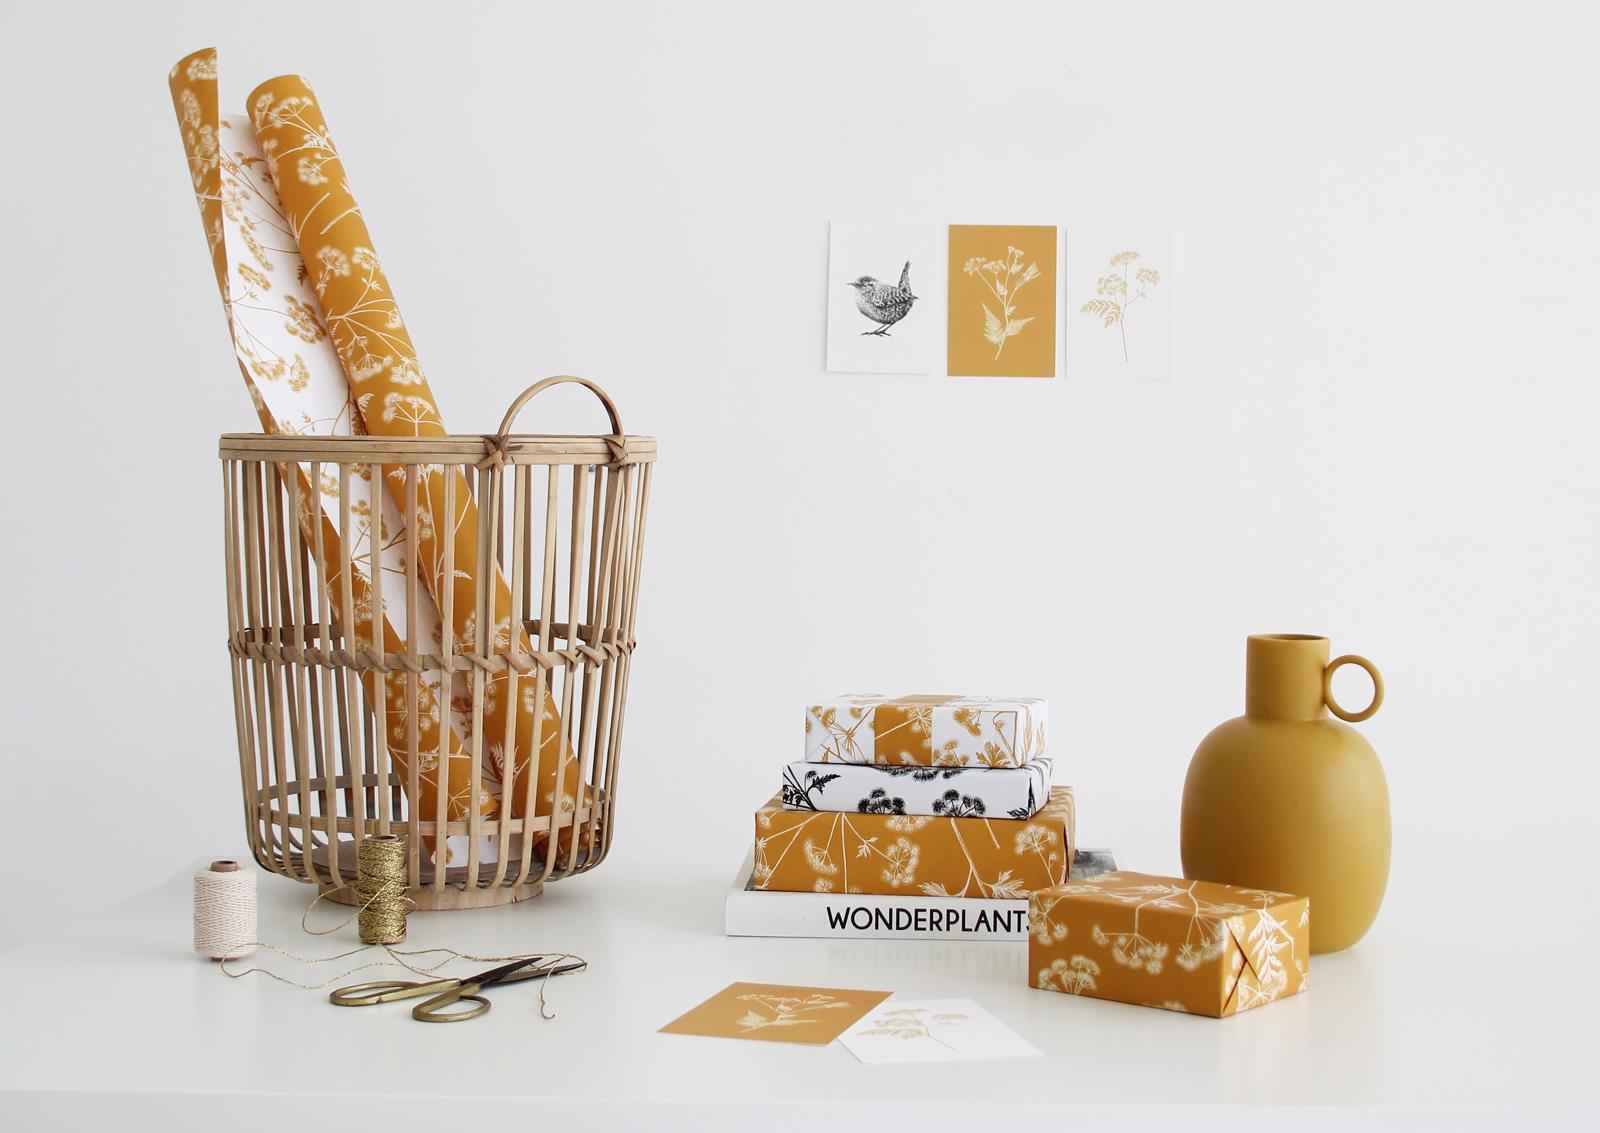 Illustraties inpakpapier Ompak, Studio Mooijman en Mittelberg, grafisch ontwerbureau Den Haag